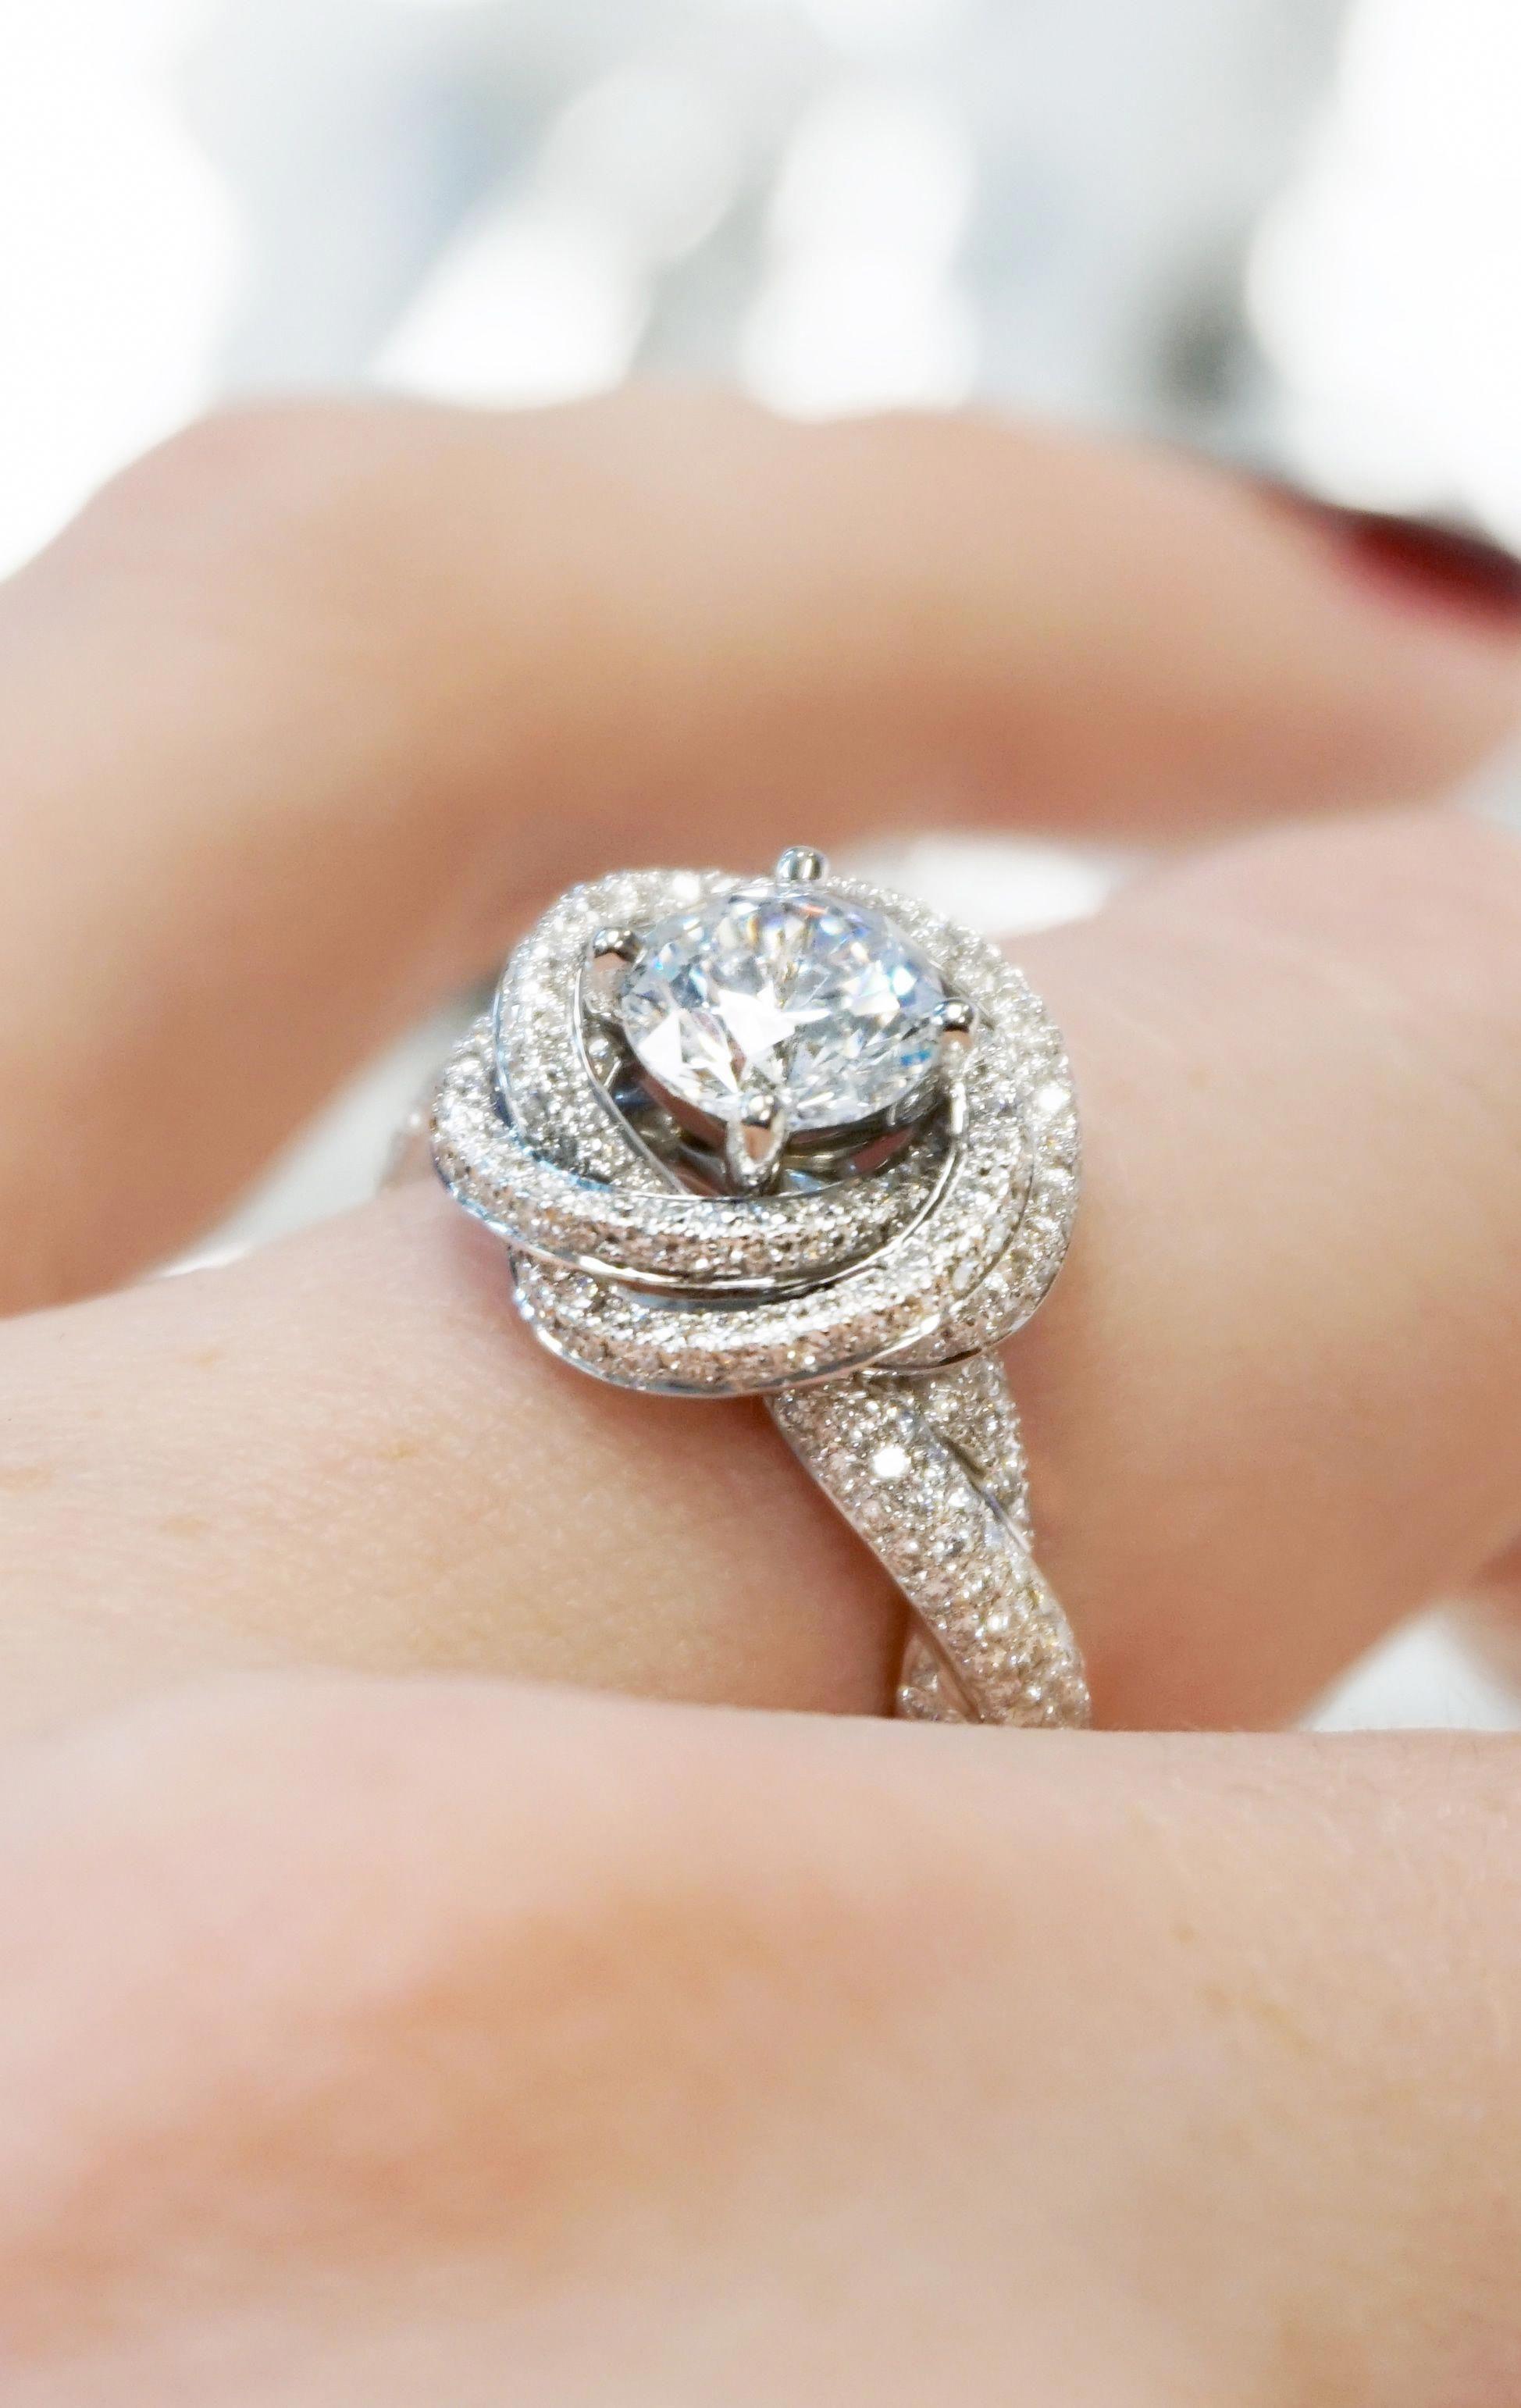 570a918818974 Modern Knot Edgeless Pavé Engagement Ring | Joseph Jewelry ...